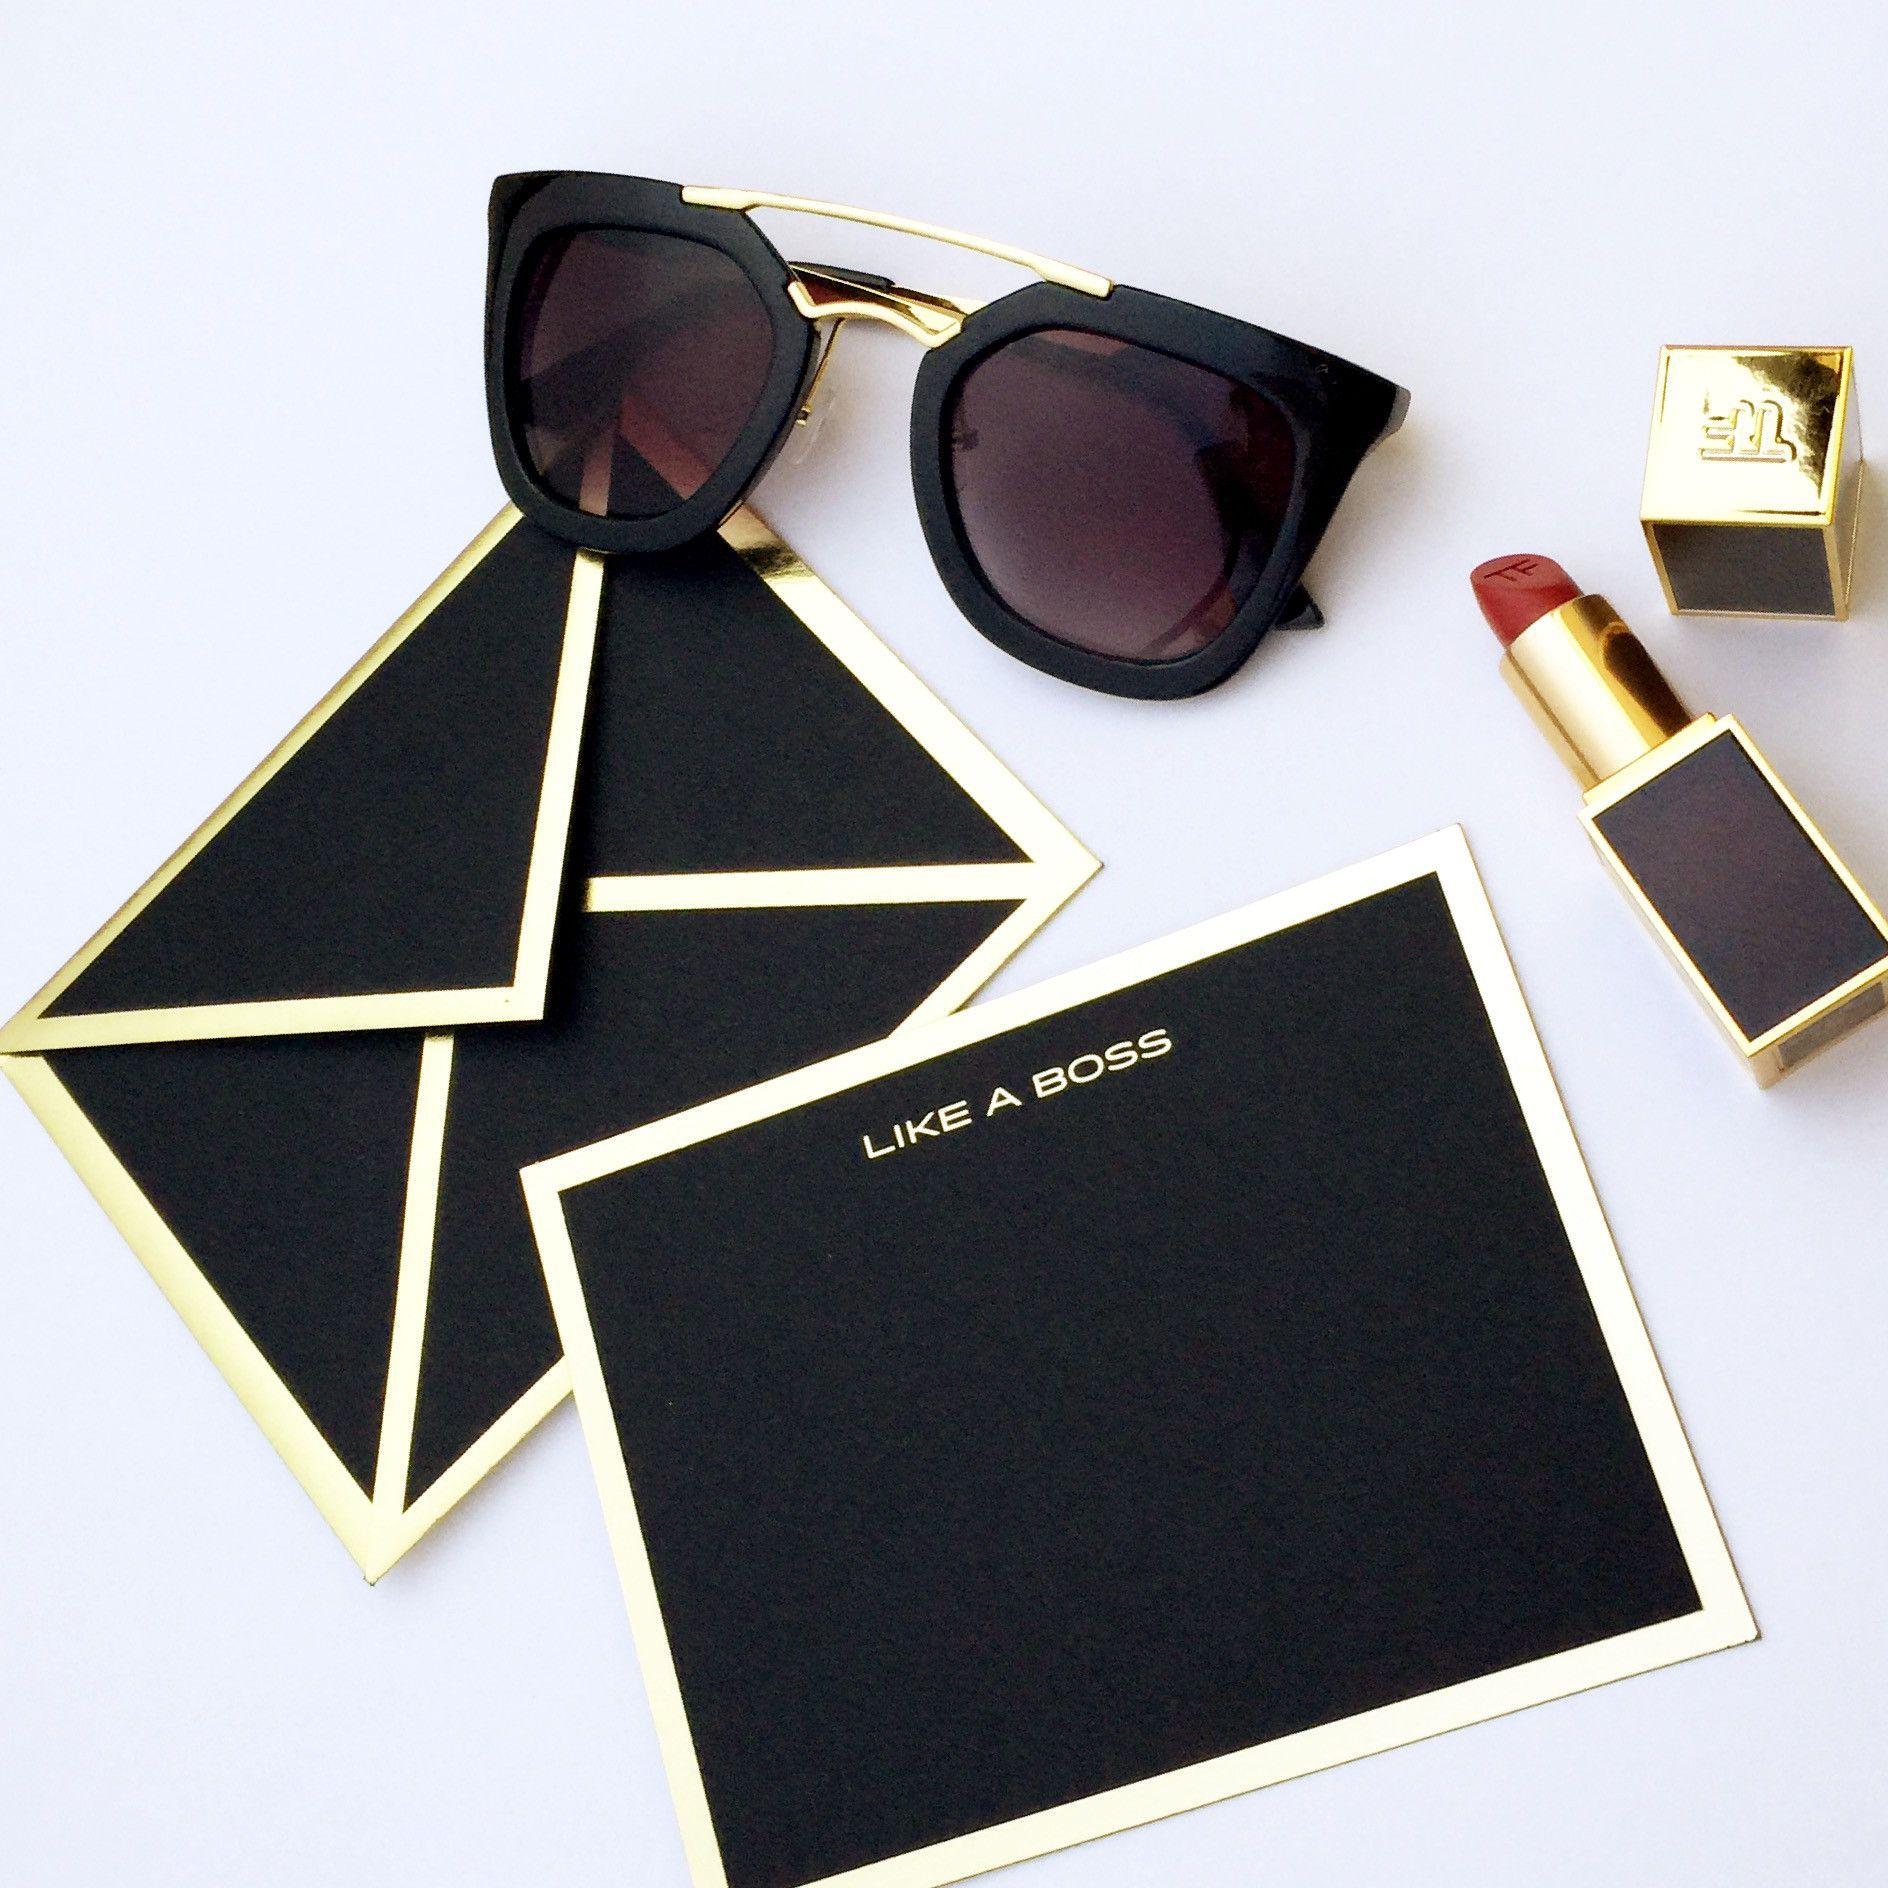 Like a boss black card envelope black card custom envelopes and like a boss black card envelope reheart Images